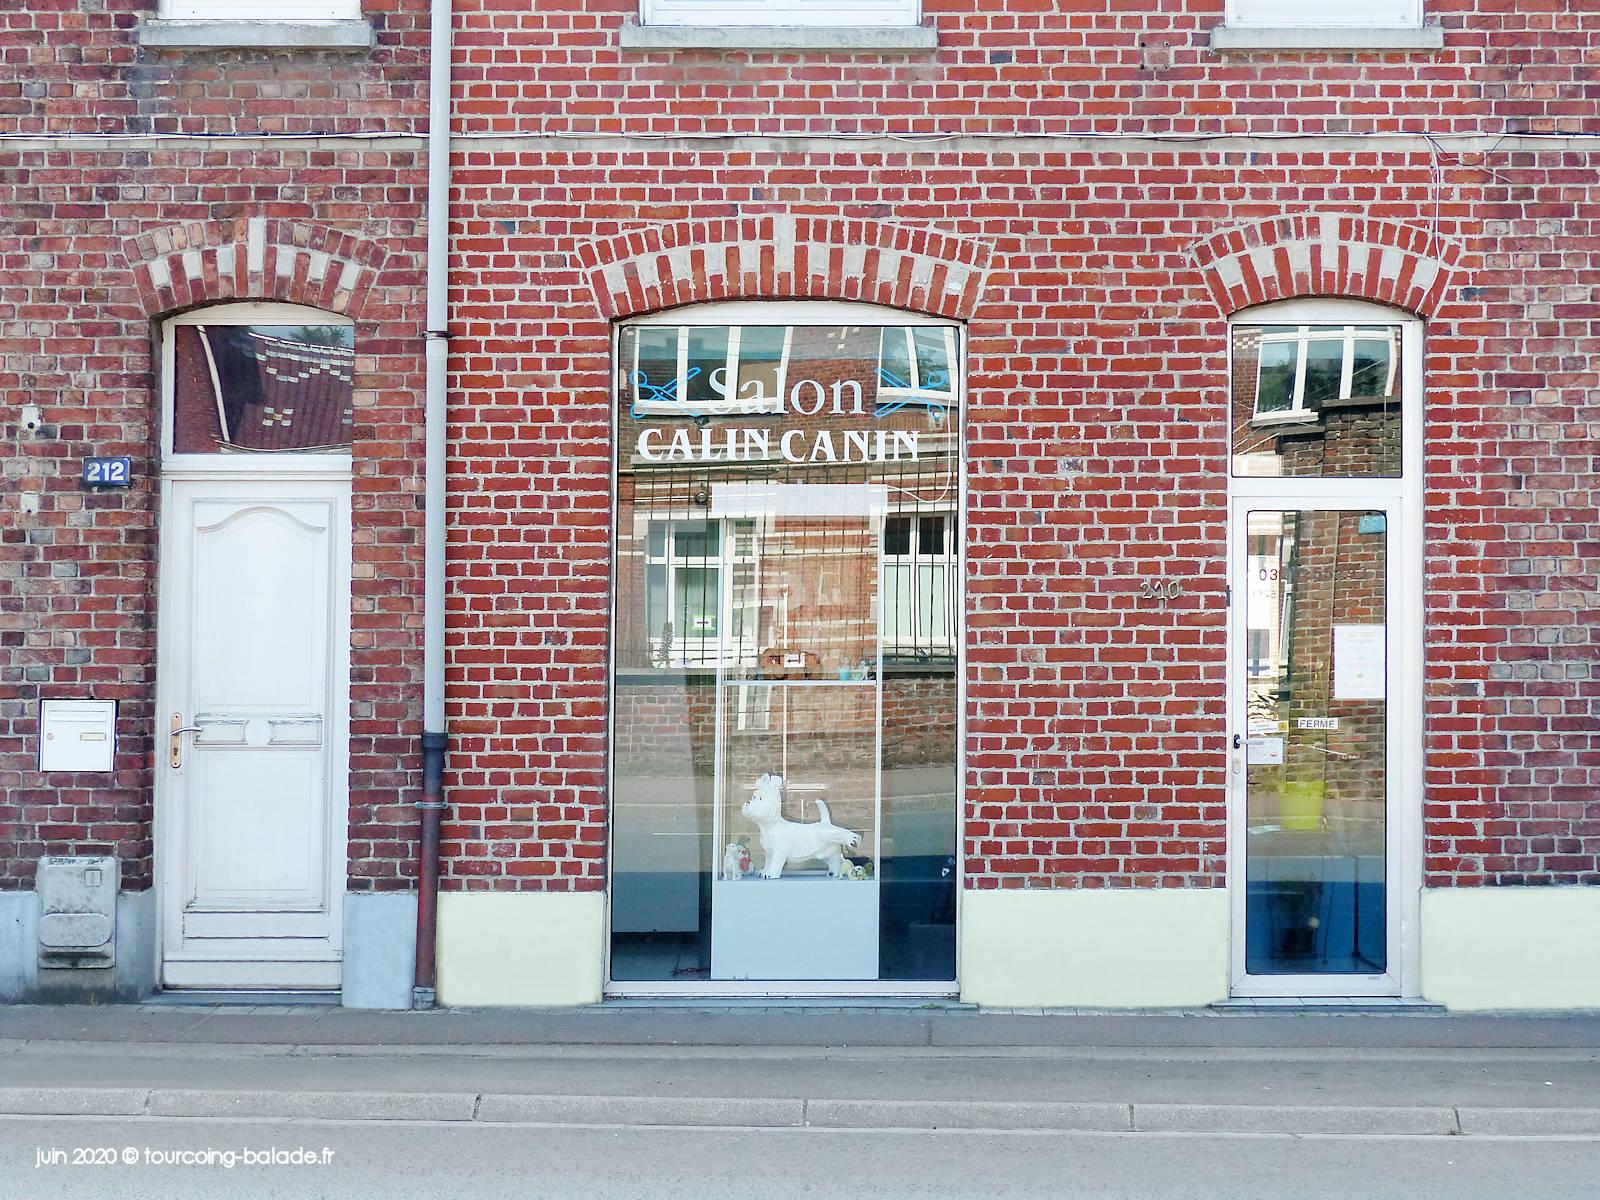 Toilettage Chiens Tourcoing - Salon Calin Canon, 2020